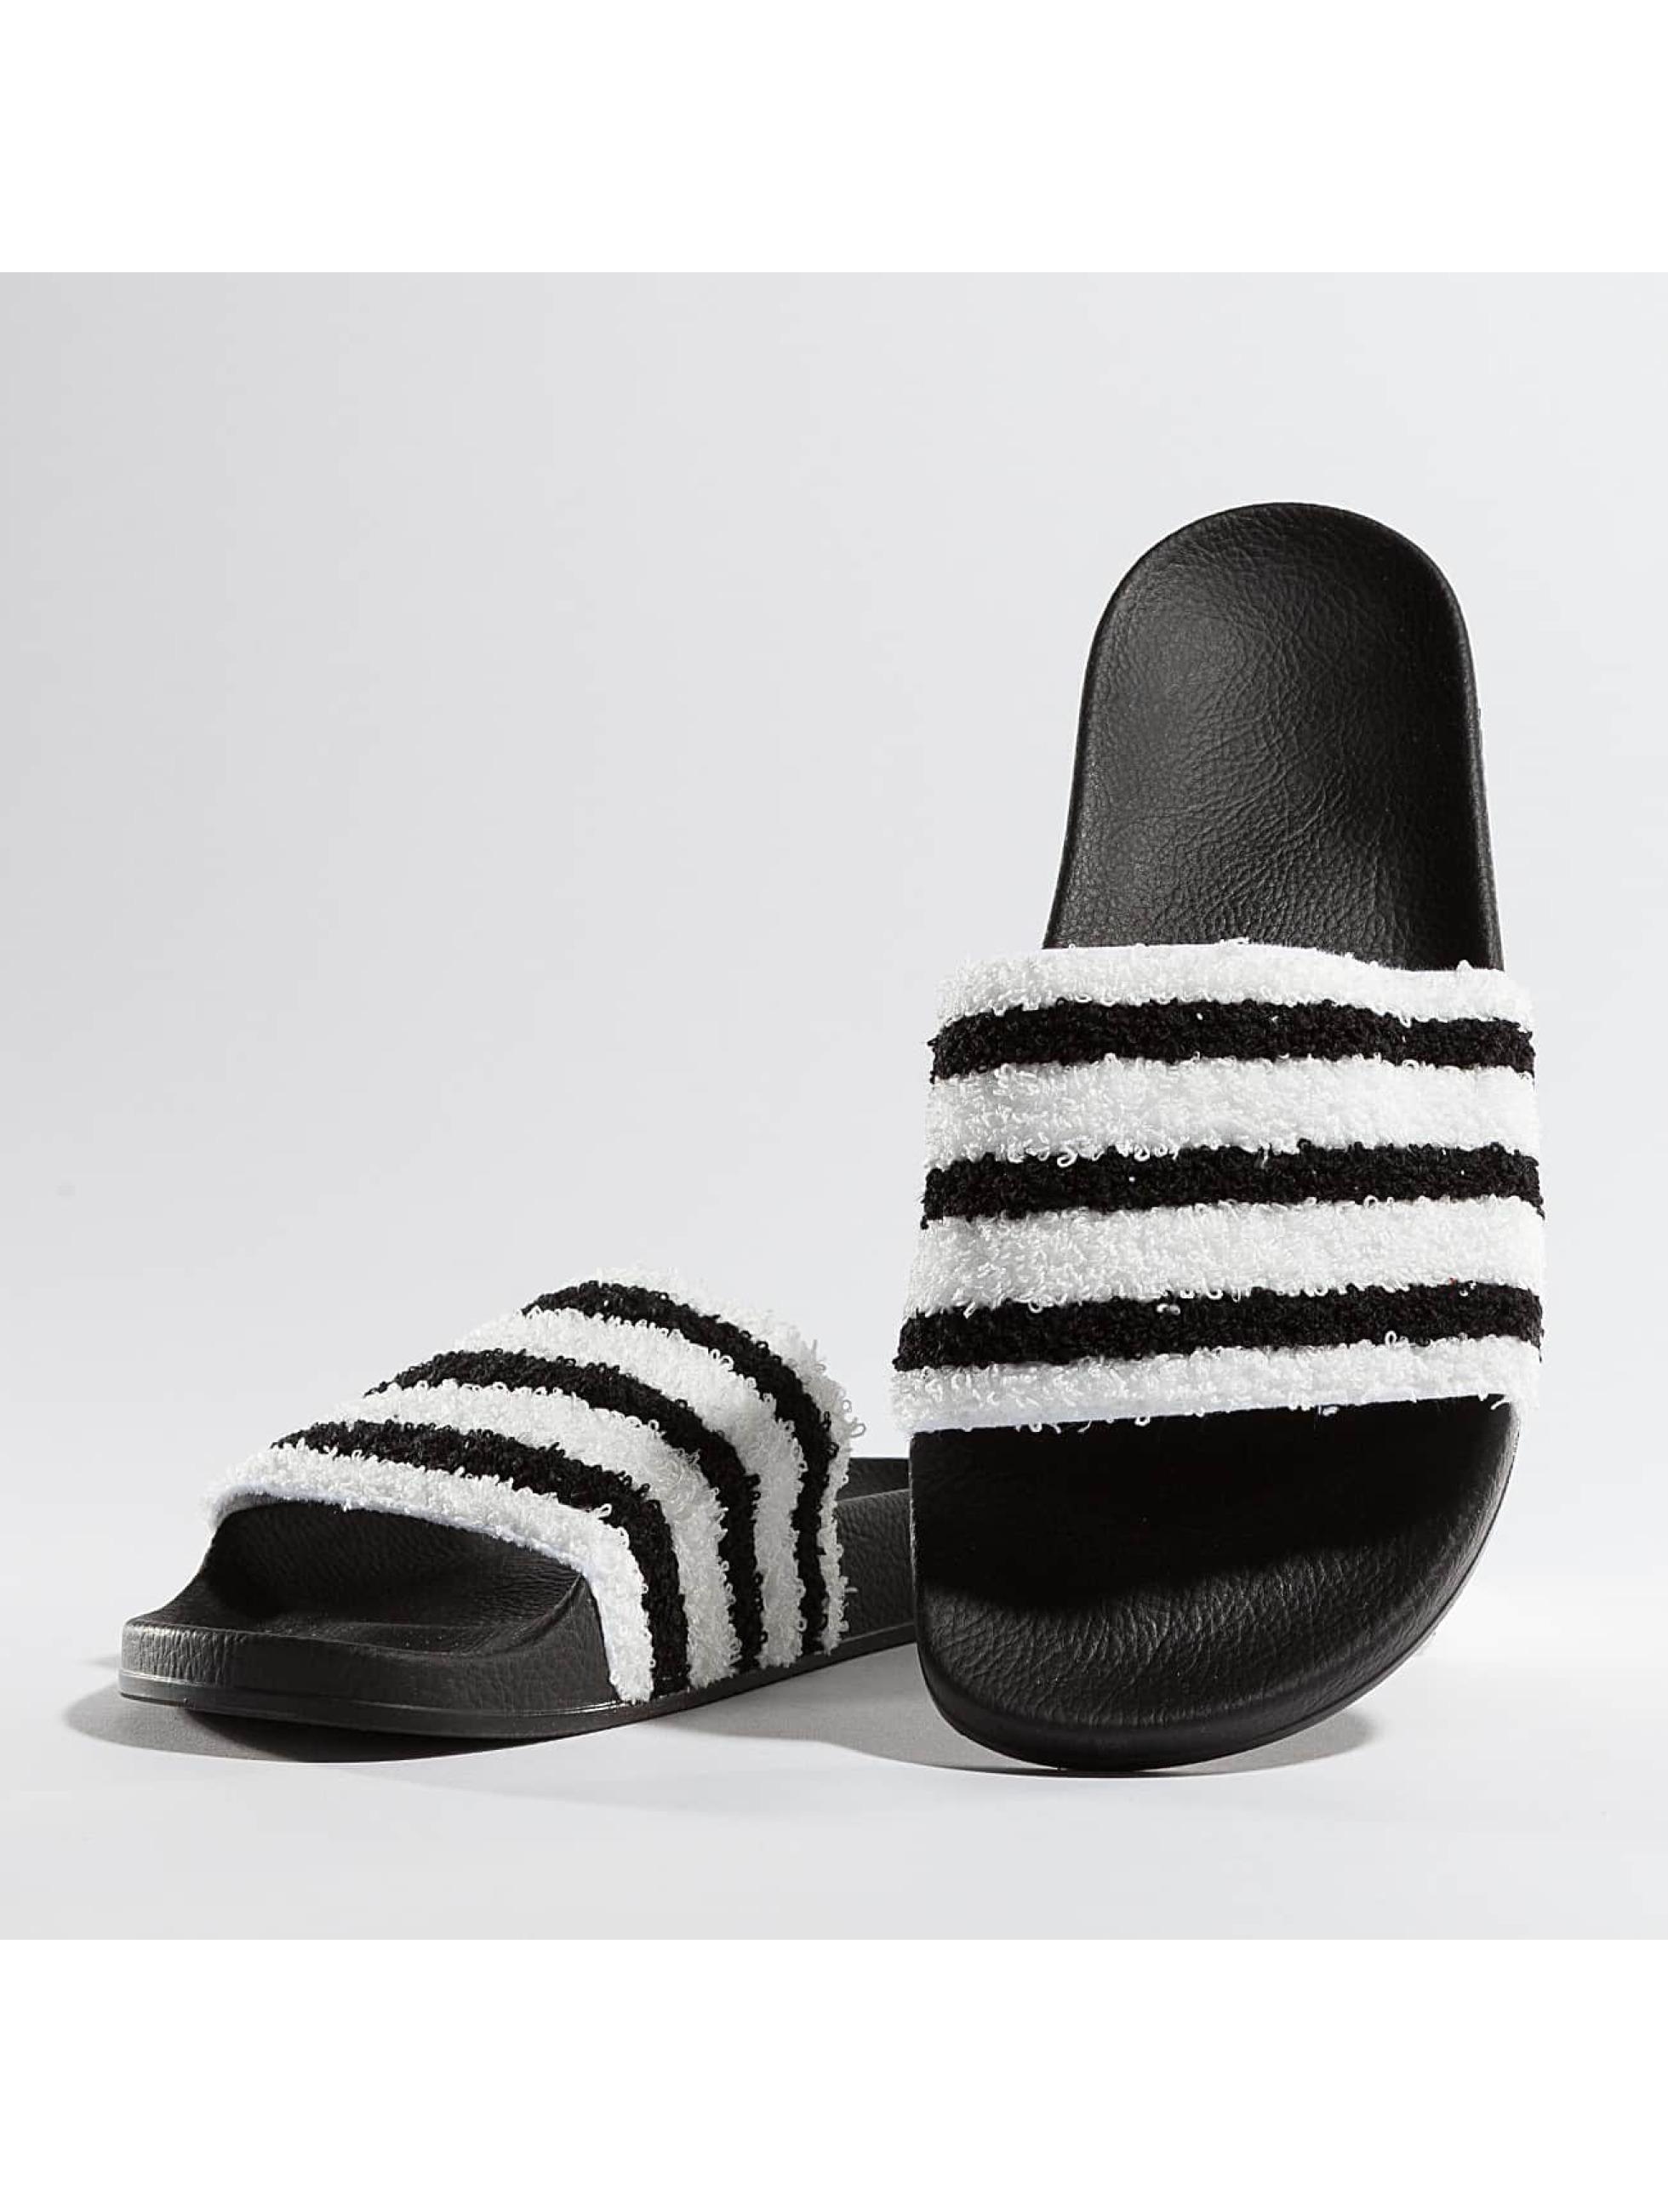 adidas Chaussures / Sandales Adilette en noir